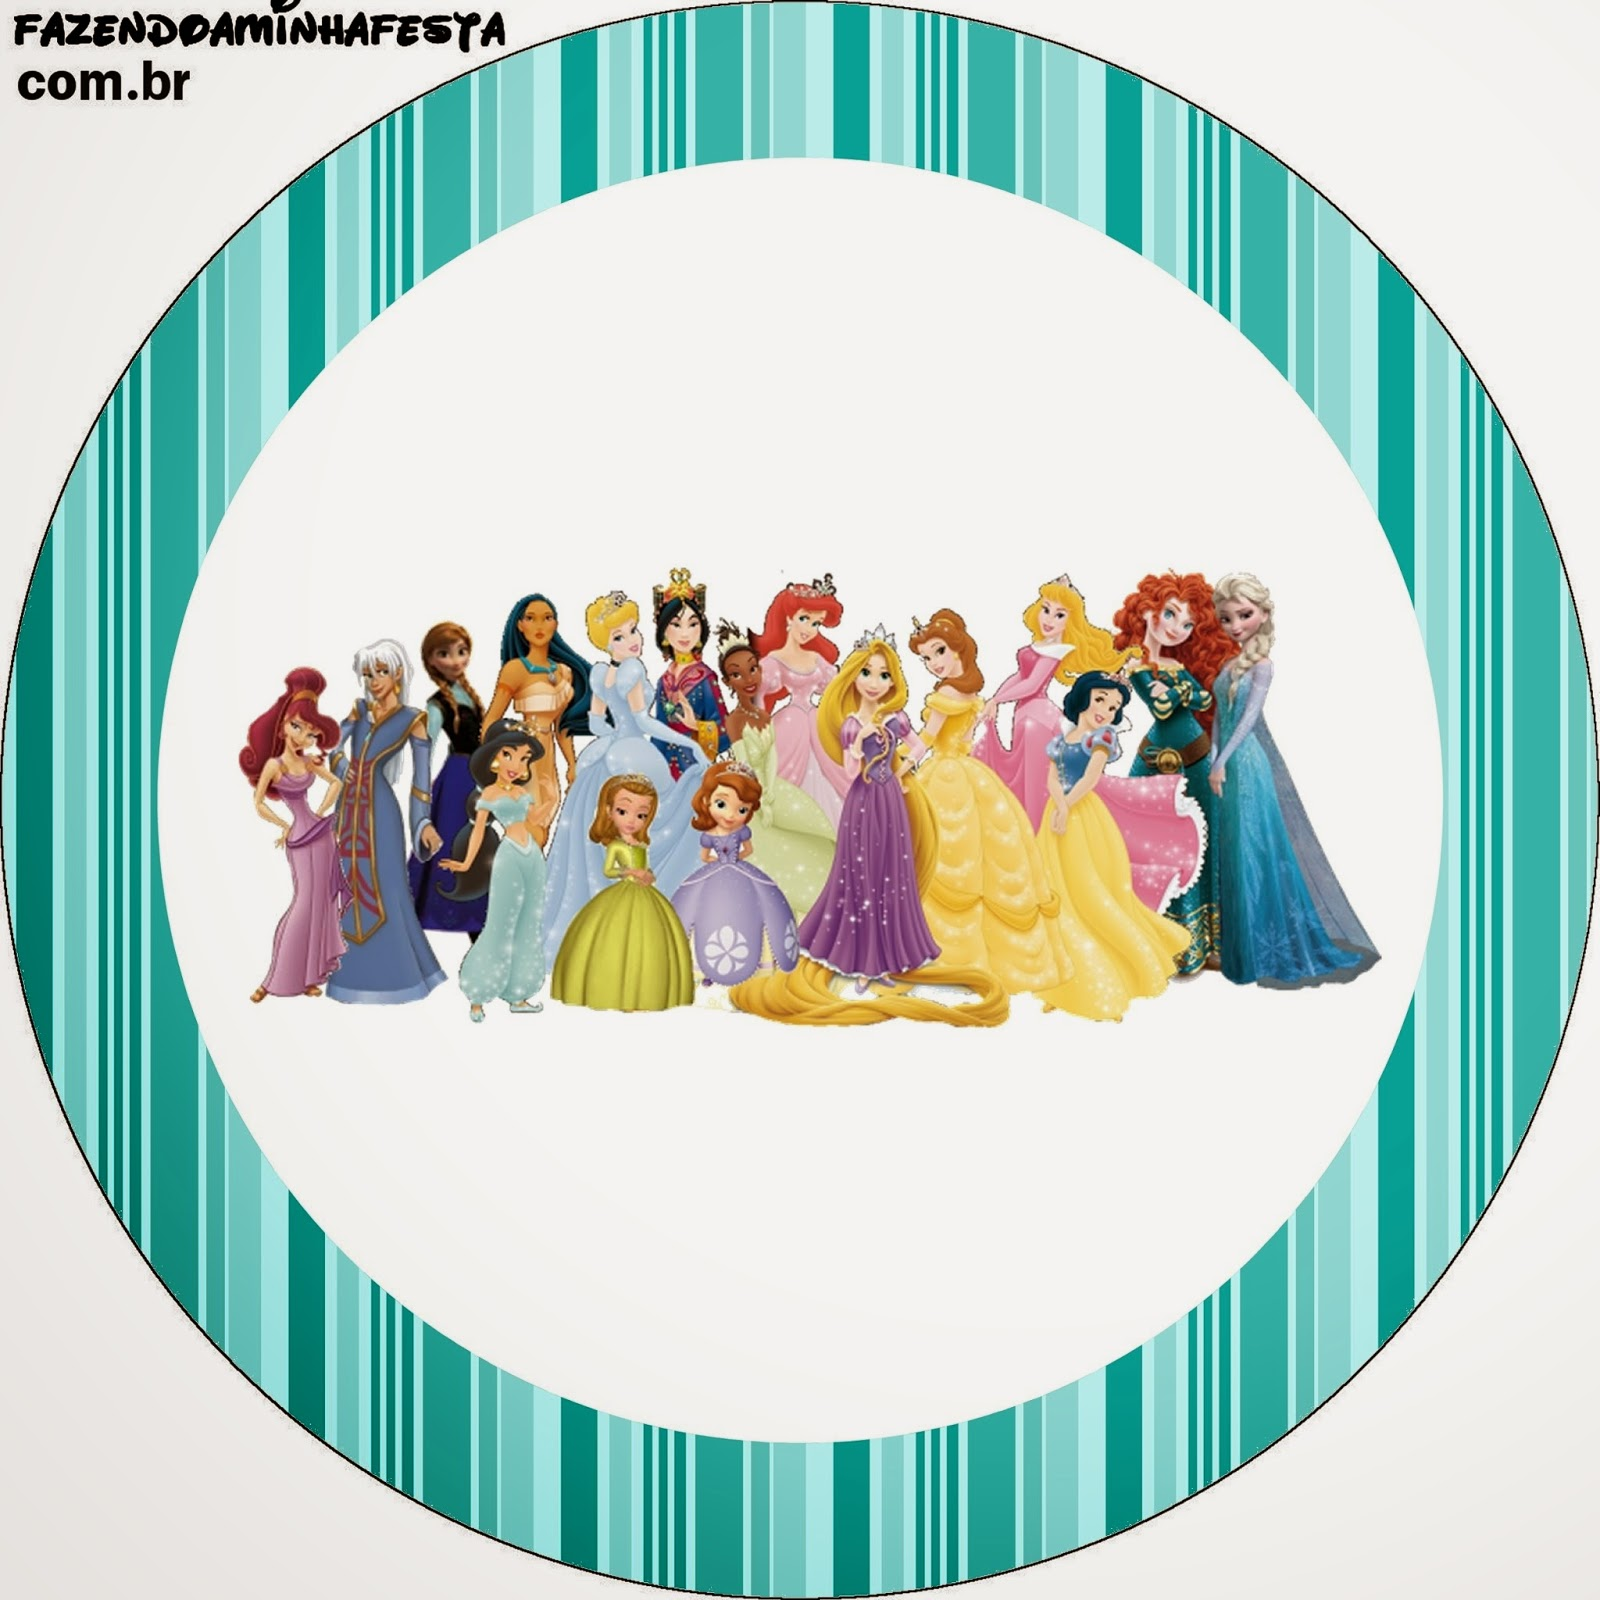 Toppers o etiquetas de Todas las Princesas Disney para imprimir gratis.